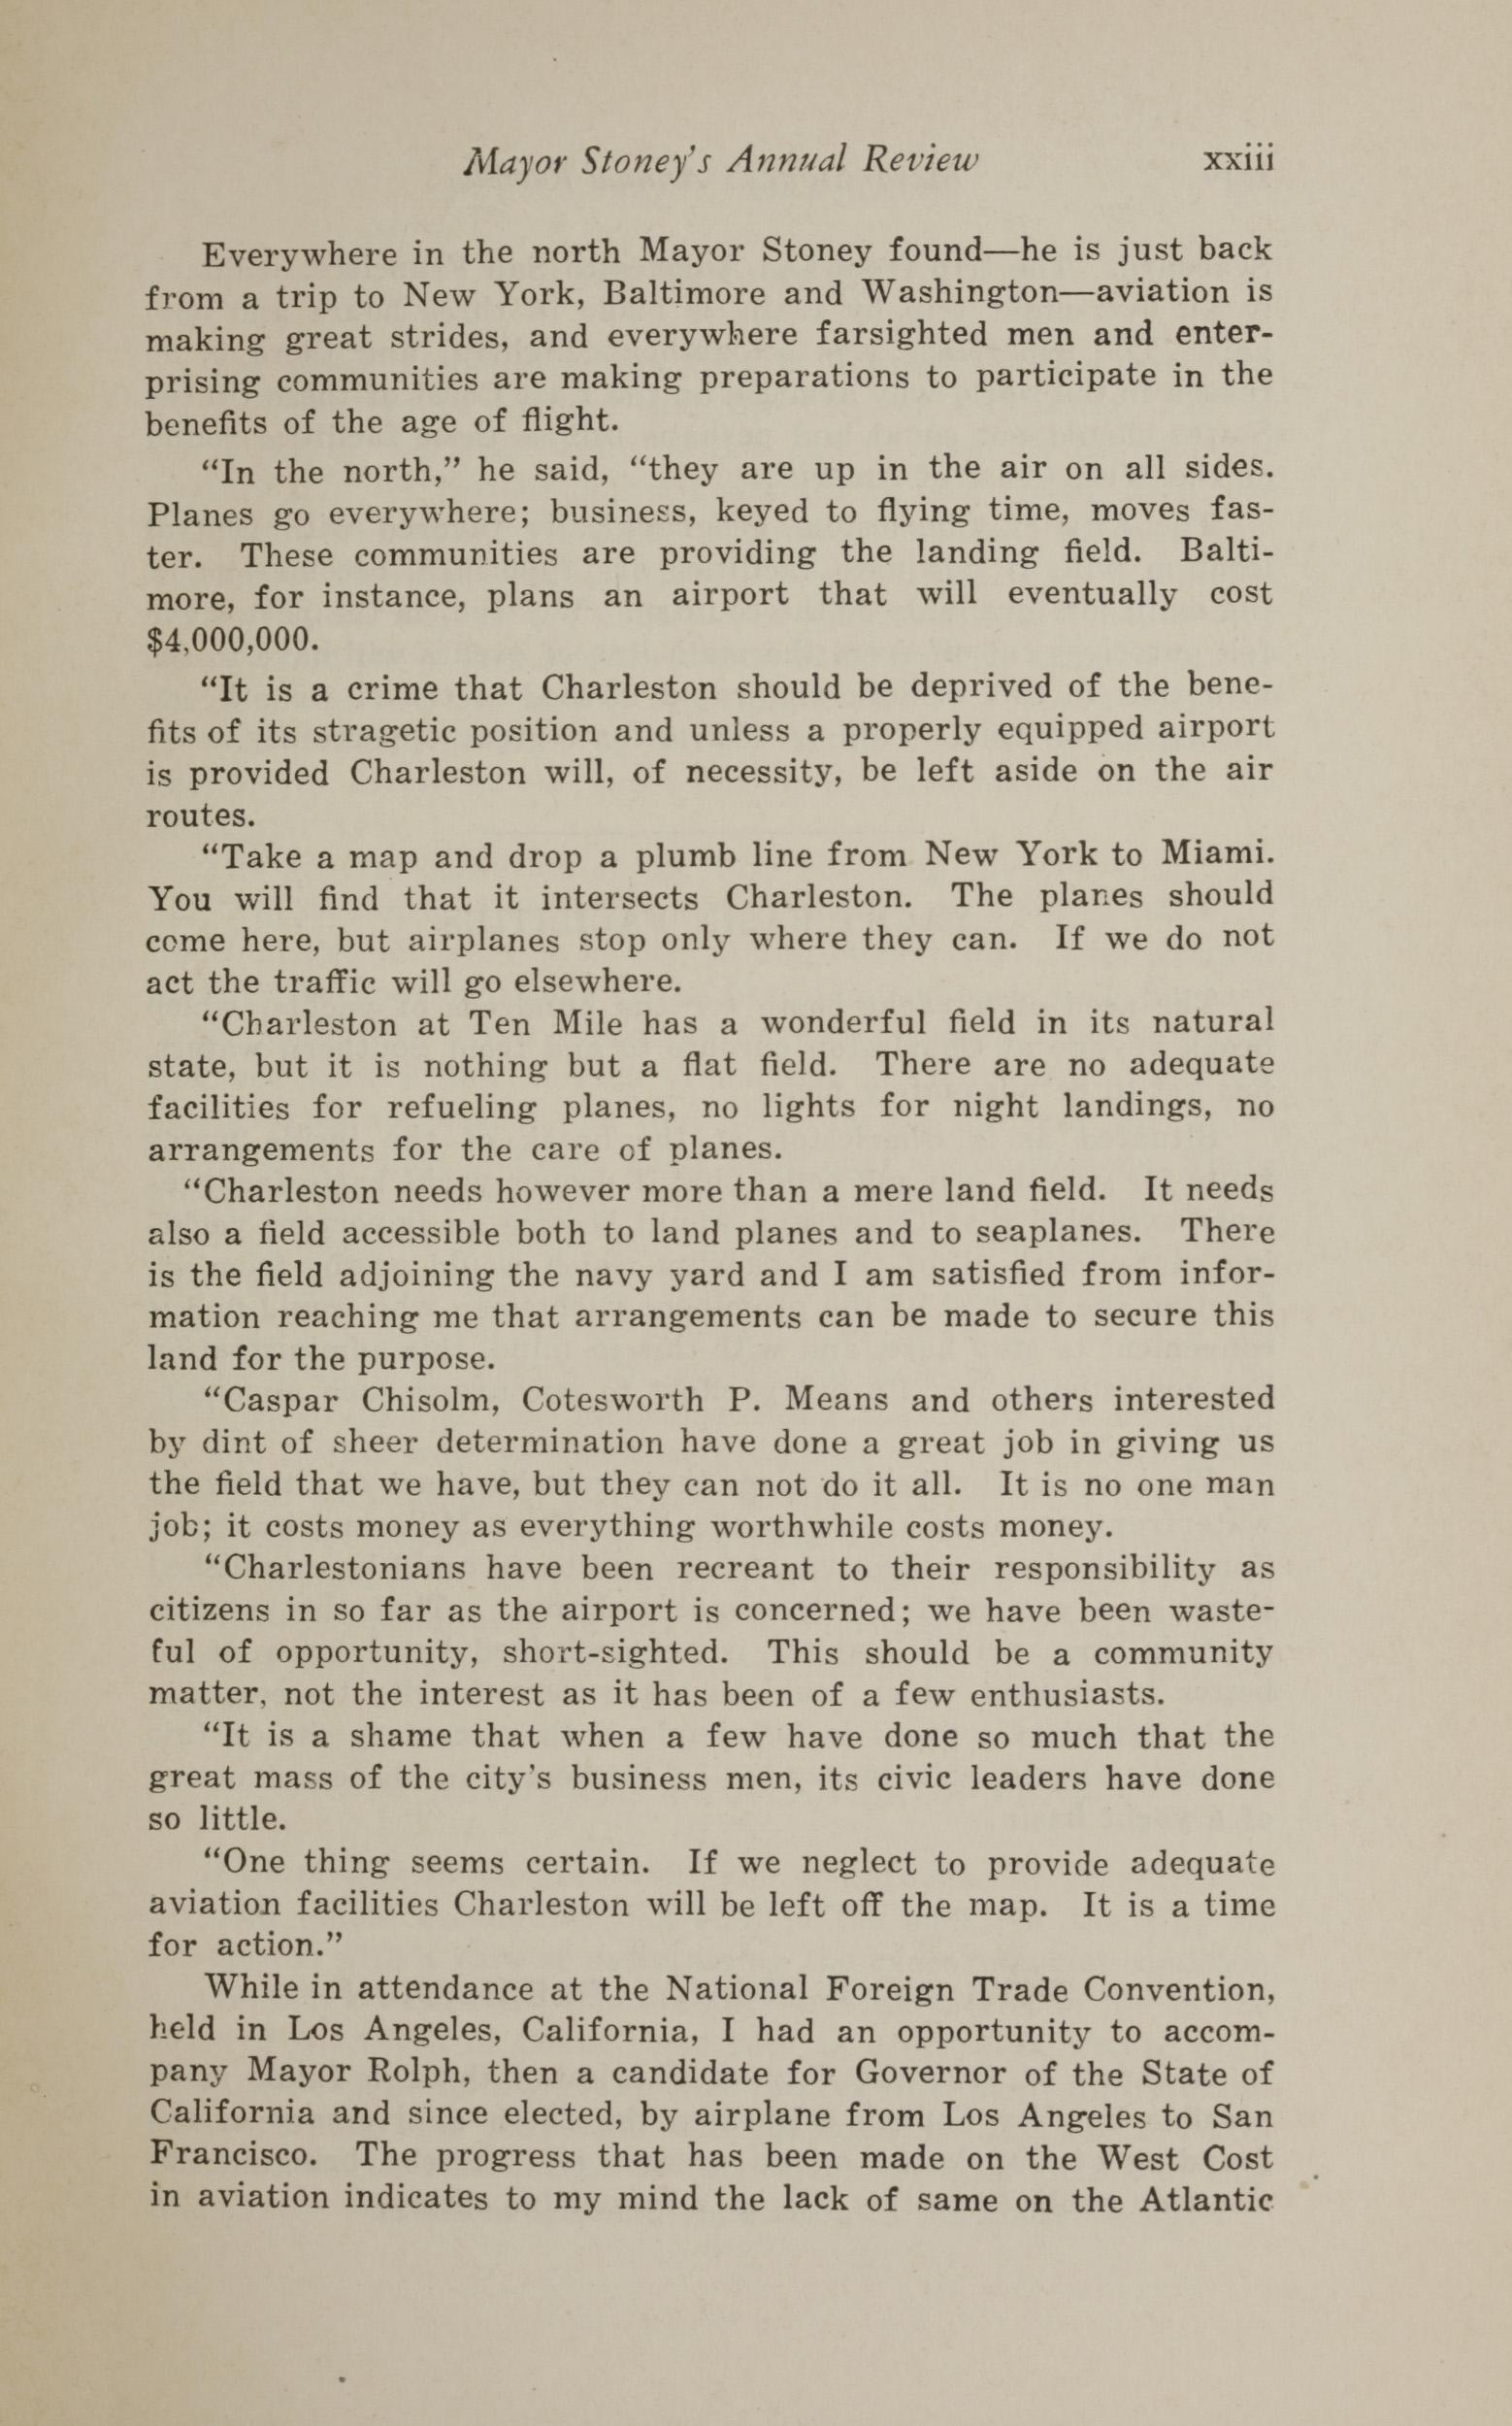 Charleston Yearbook, 1930, page xxiii